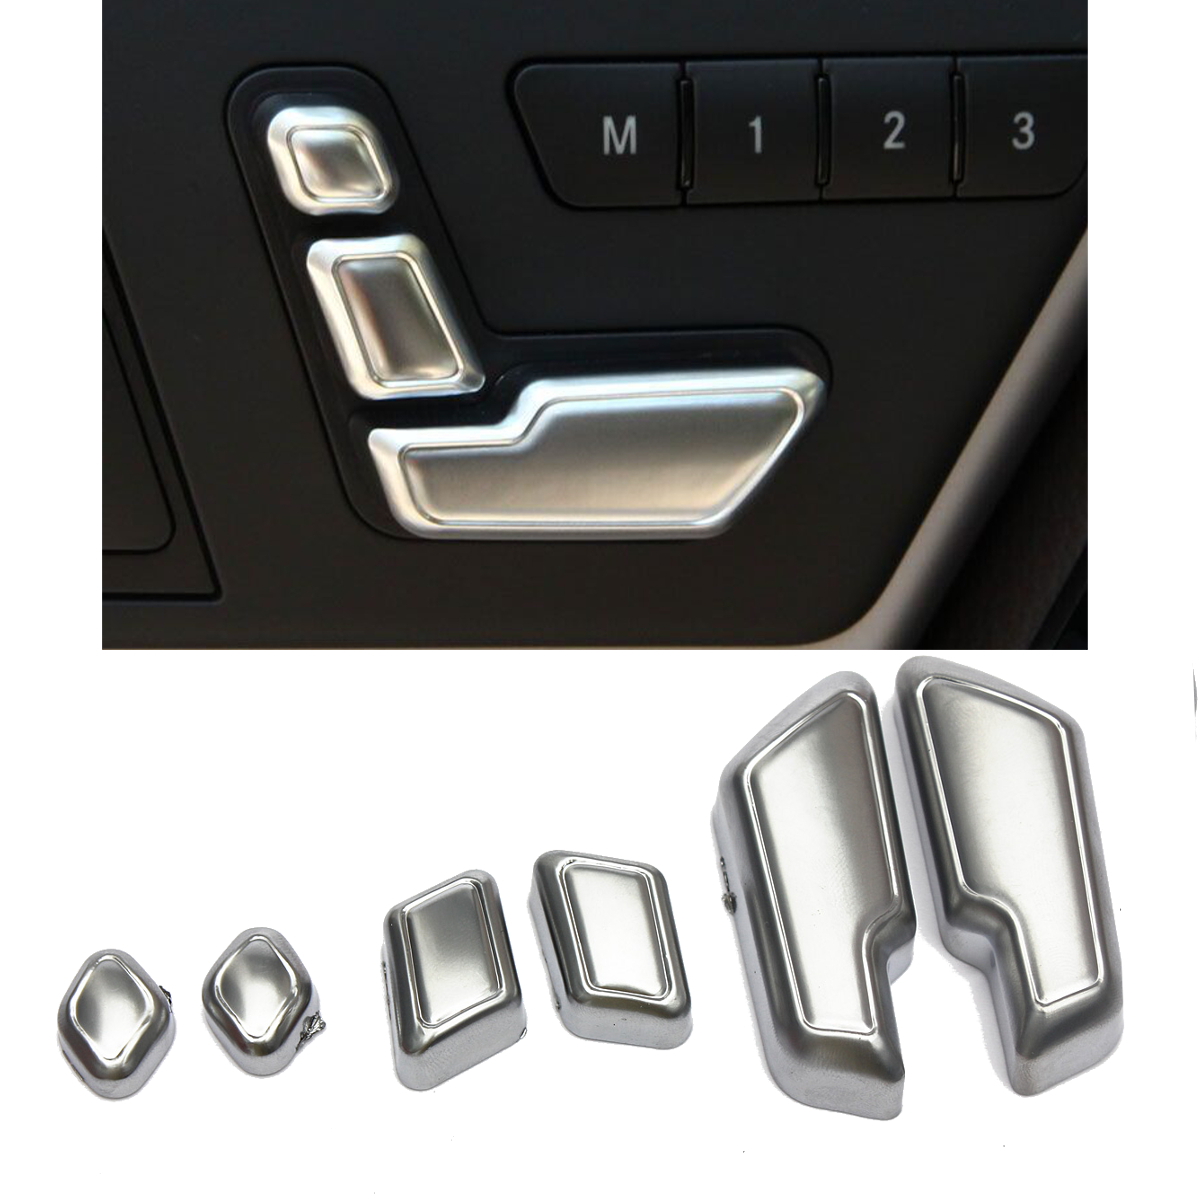 6Pcs Chrome Car Door Seat Adjust Buttons Switch for Mercedes-Benz E Class W204 W205 W212 W218 X204 X166 C E GLK GL ML CLS GL